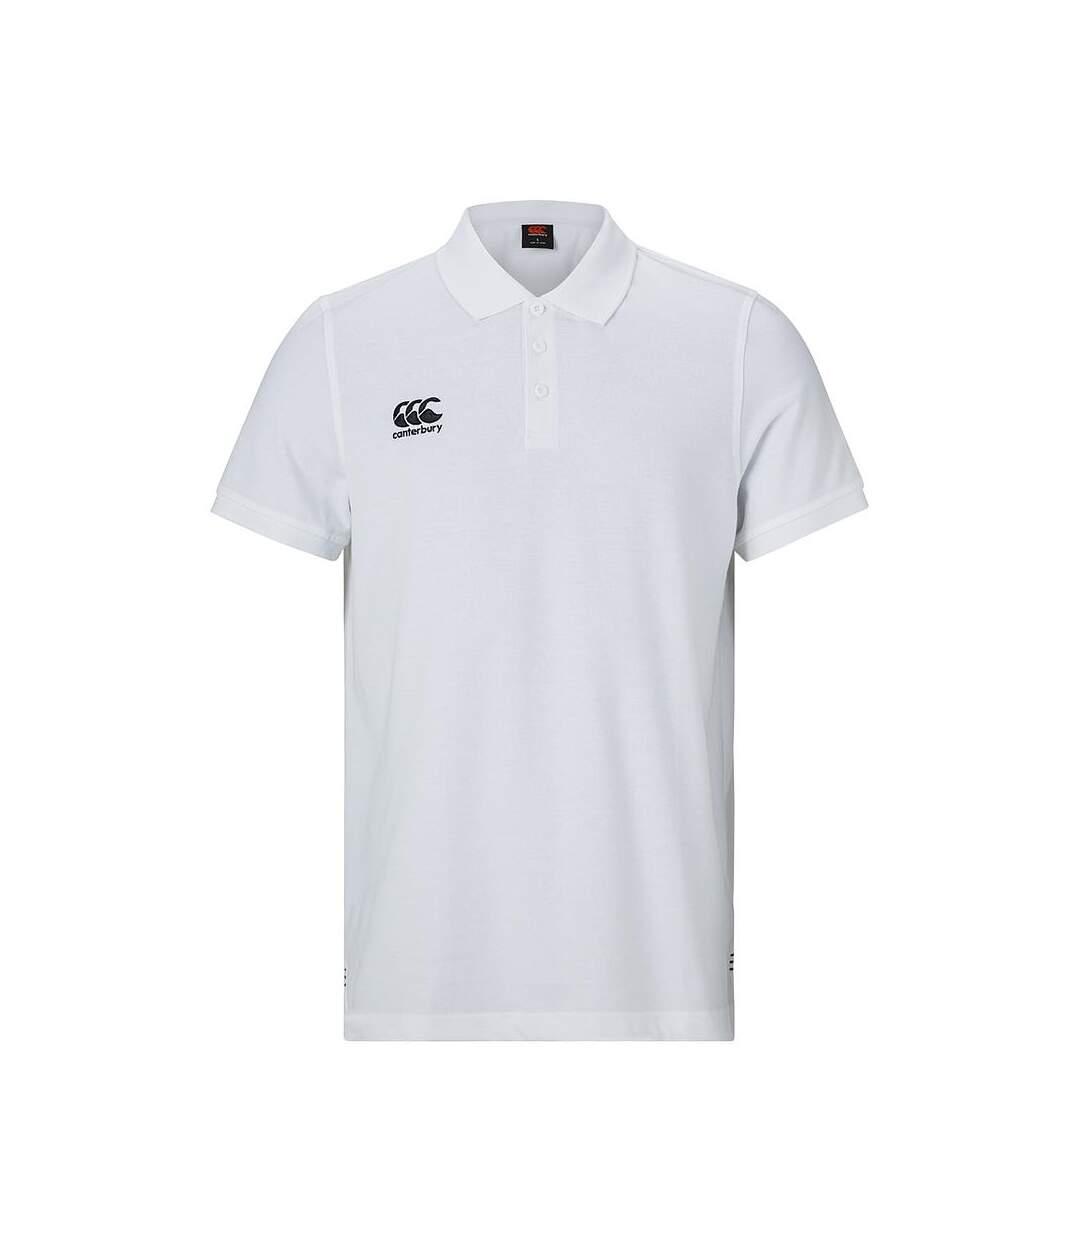 Canterbury Mens Waimak Polo Shirt (White) - UTRD763